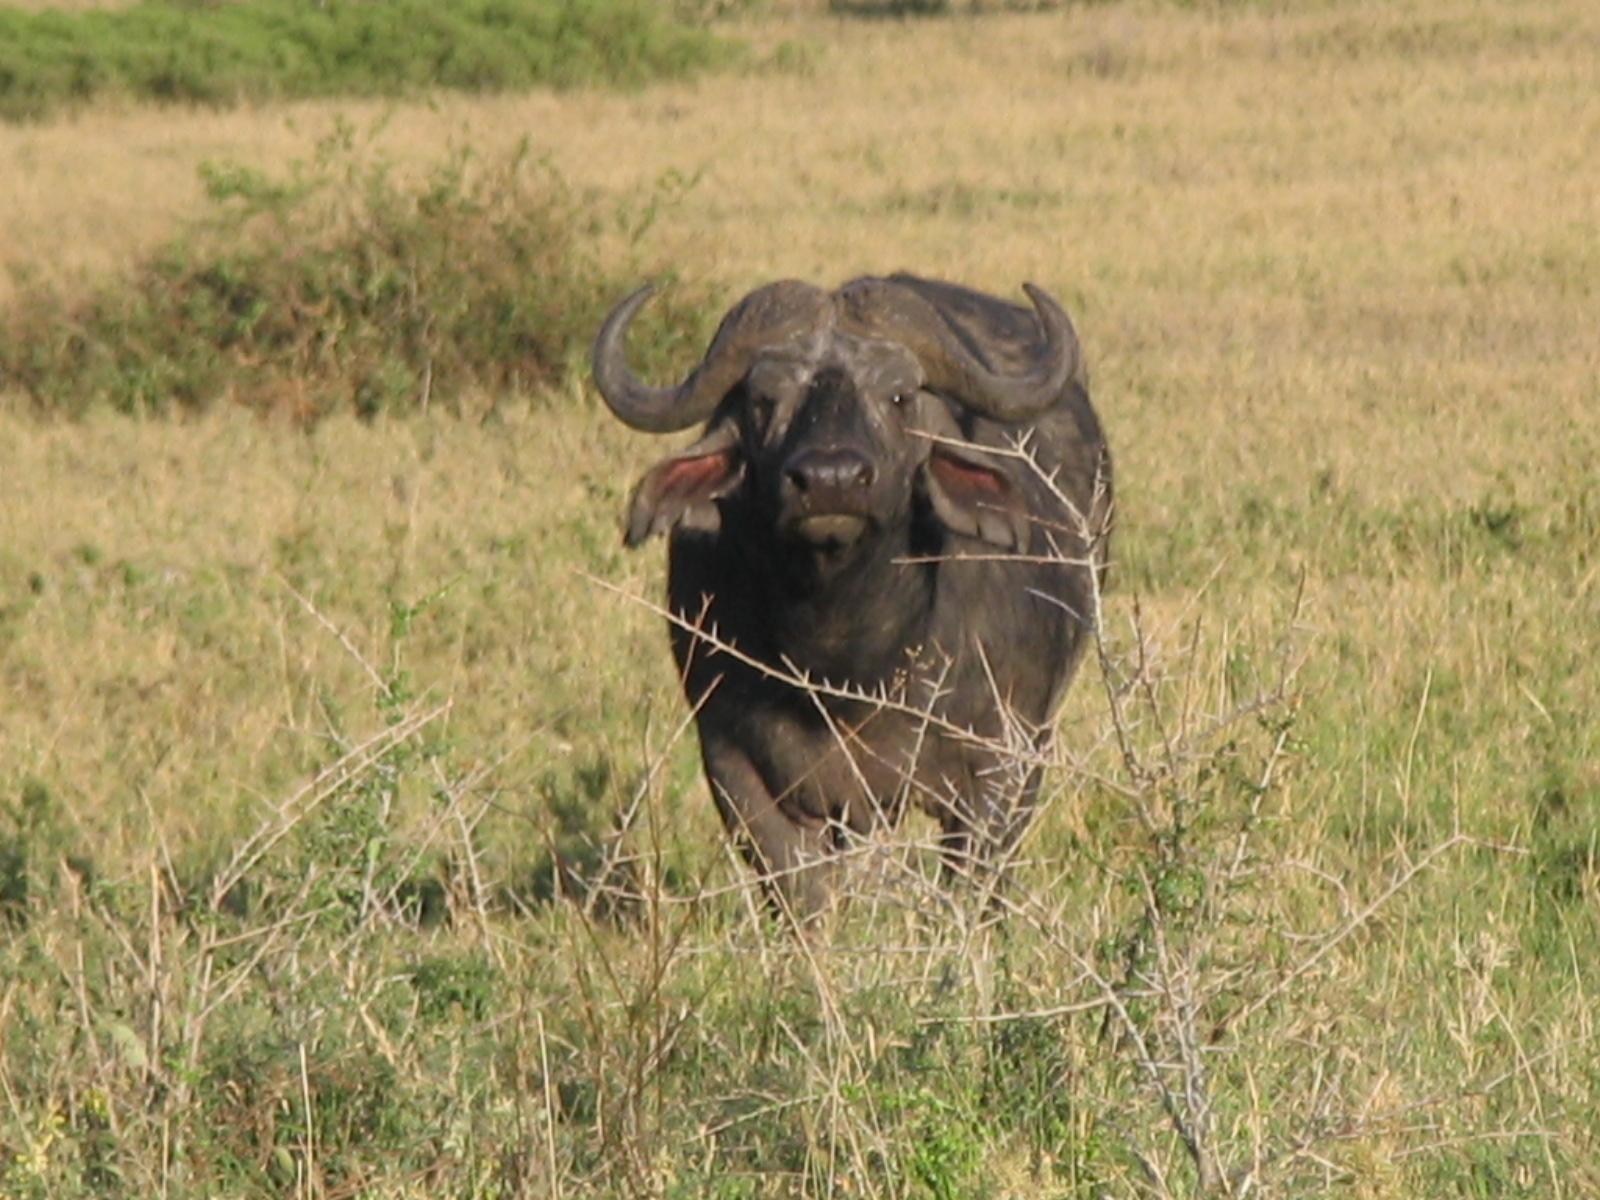 Serengeti National Park Wikipedia - 9 things to see and do in serengeti national park